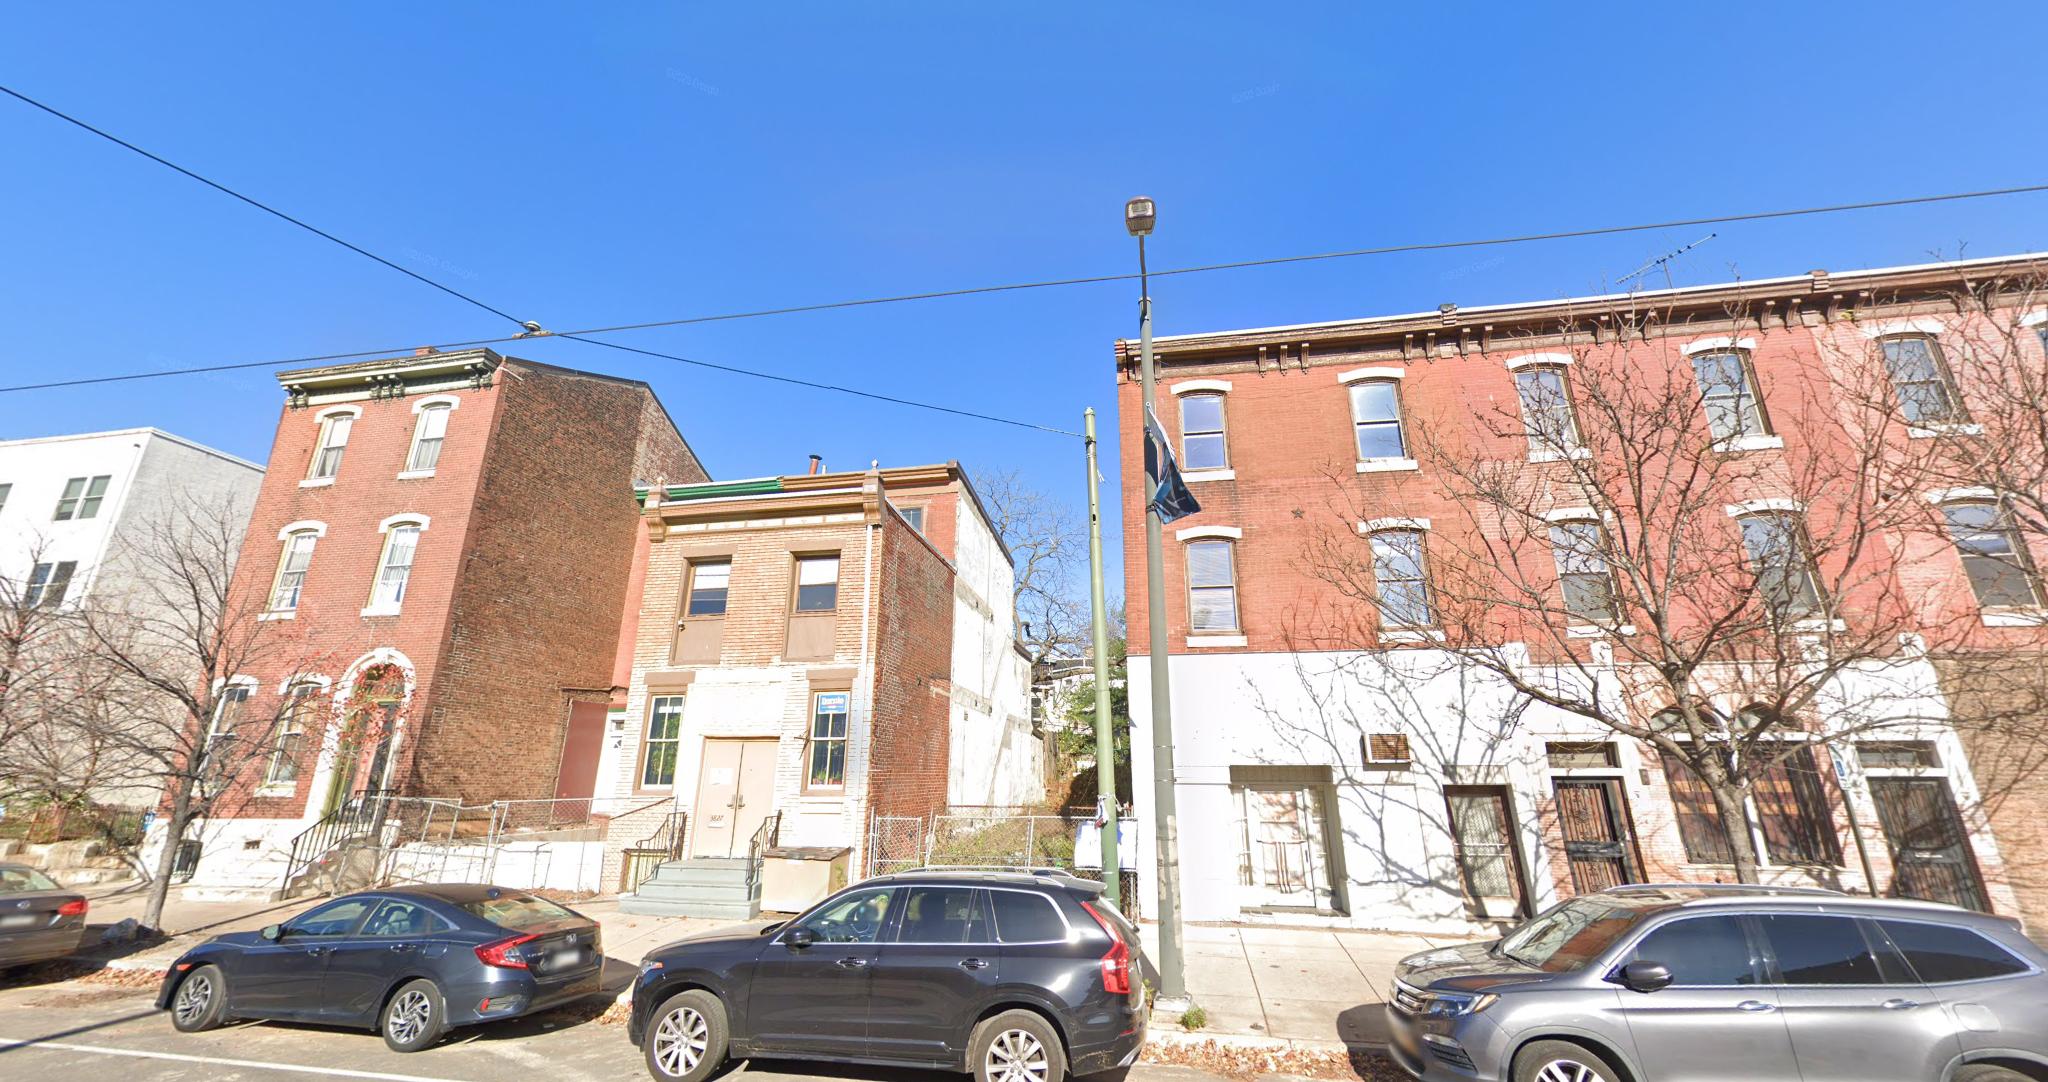 Current view of 3825 Lancaster Avenue. Credit: Google.